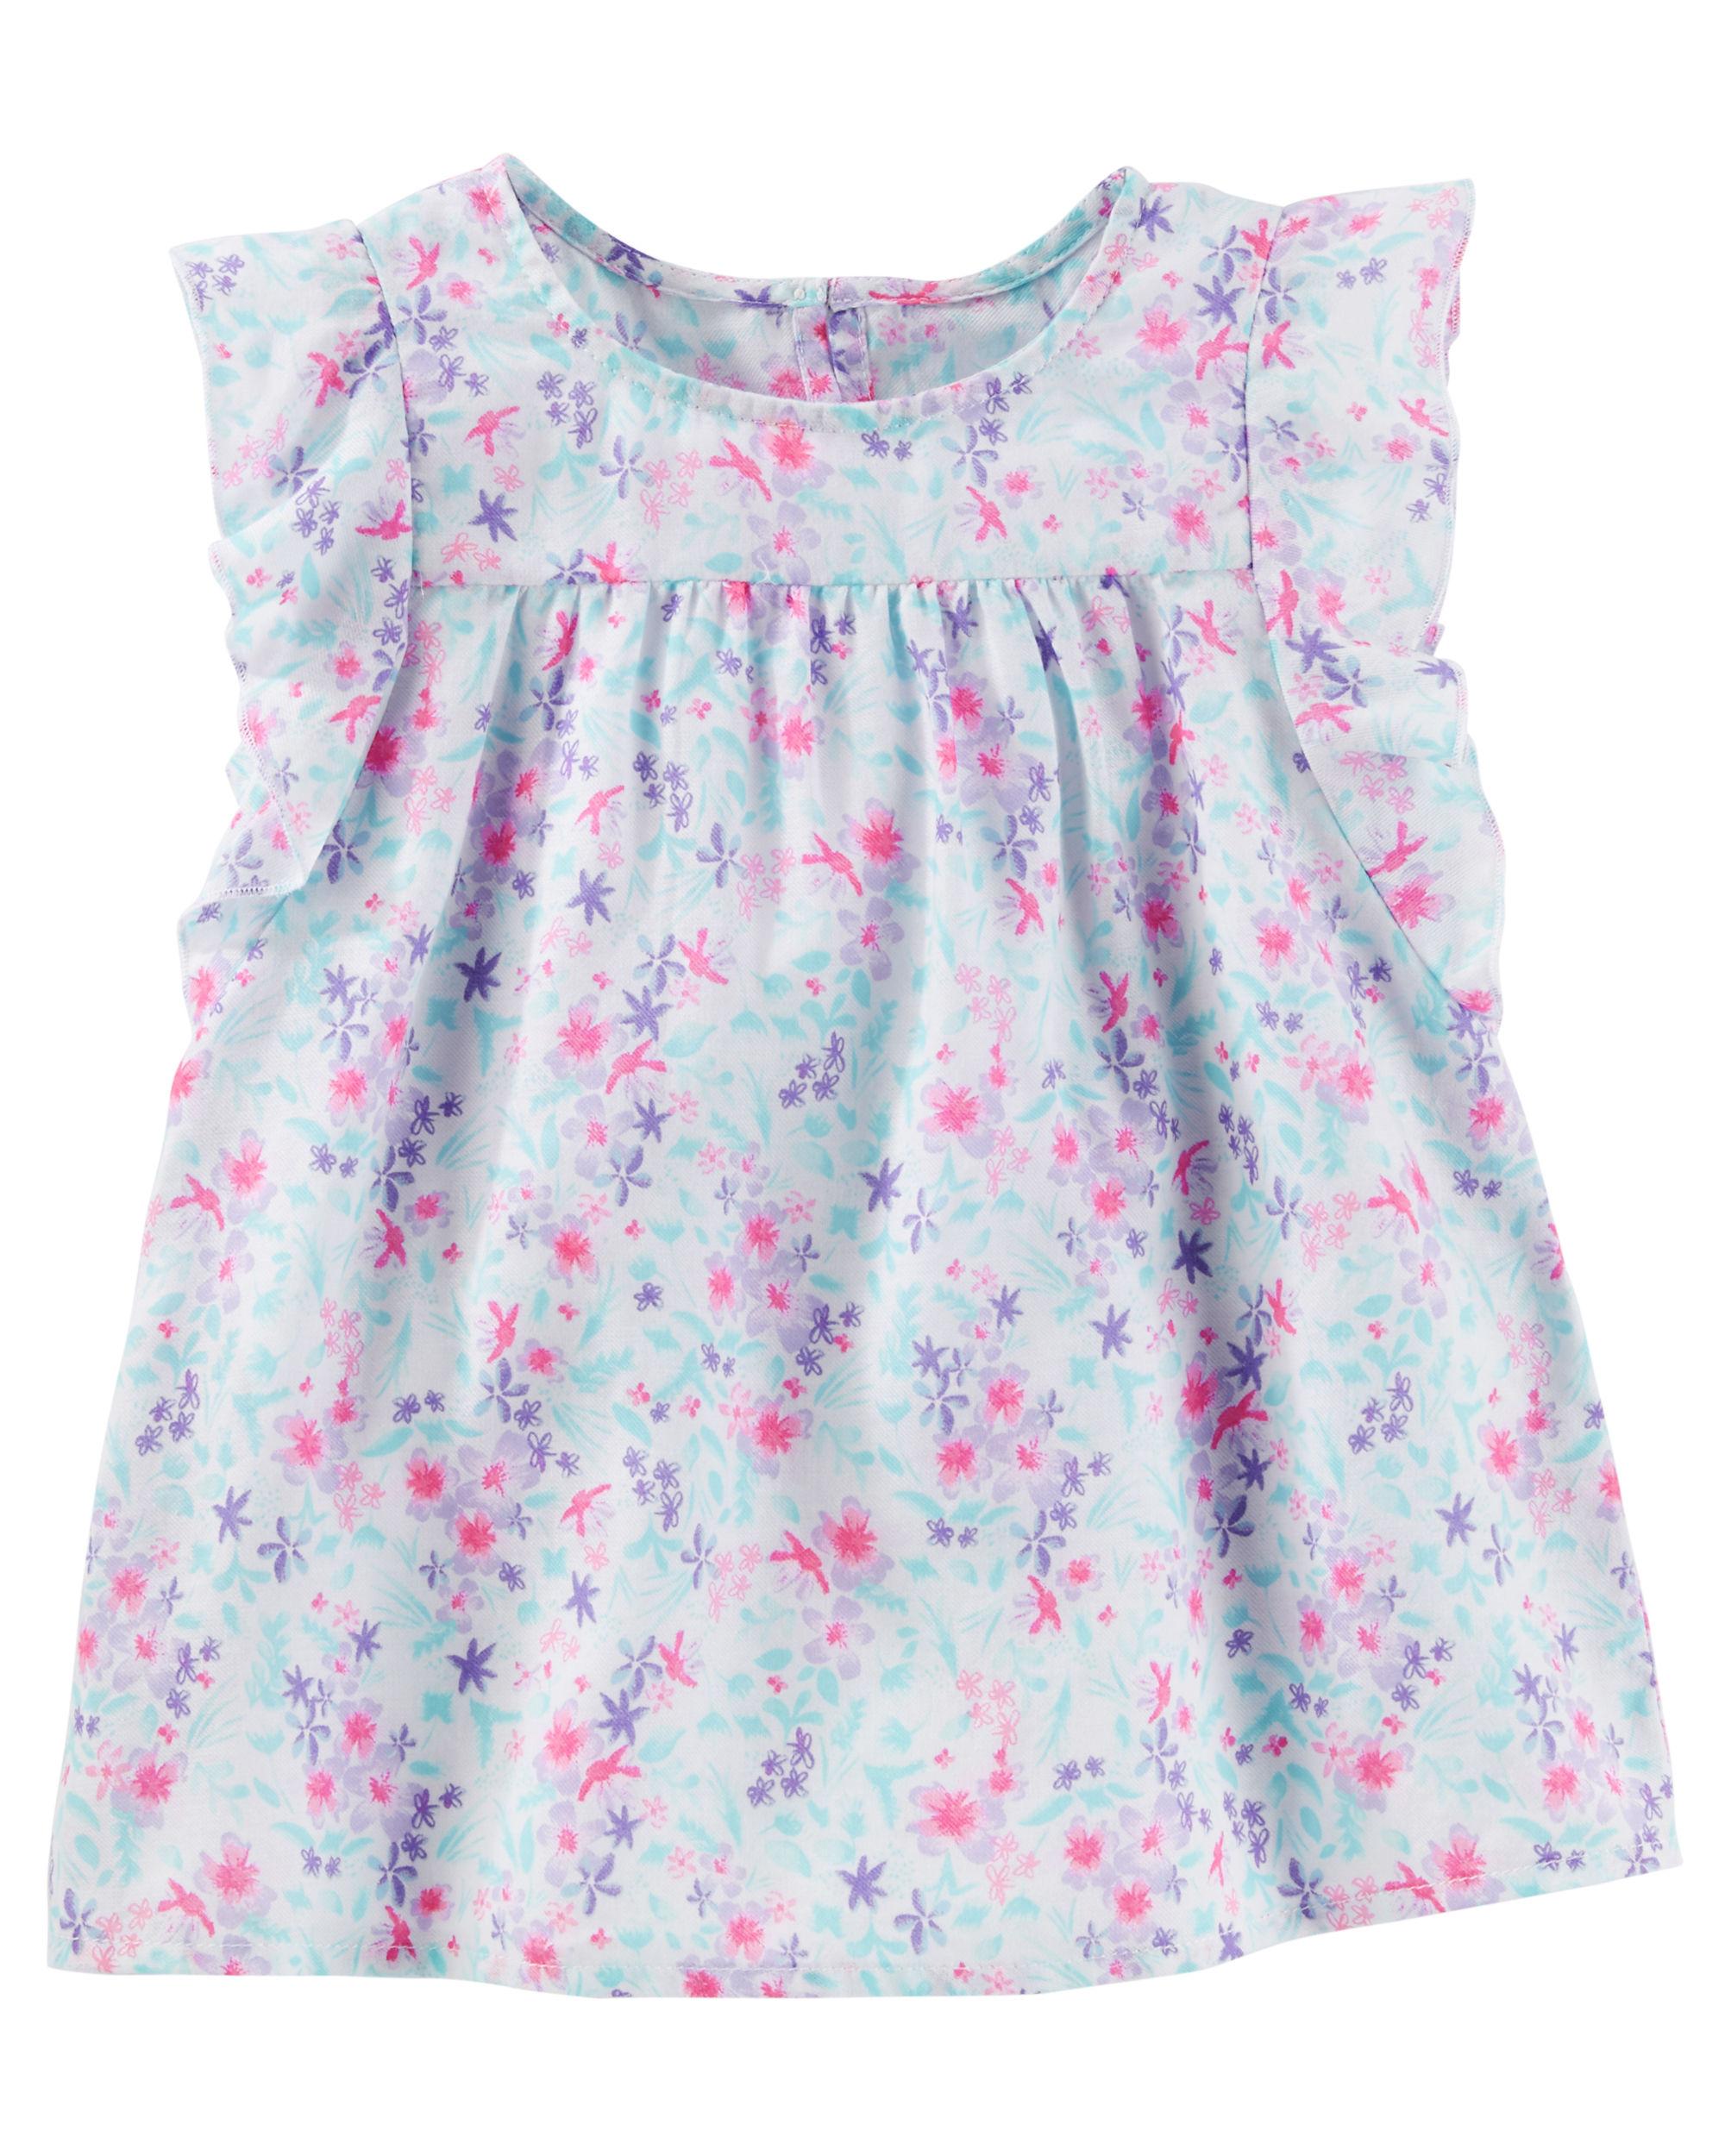 Oshkosh B'gosh Little Girls' Floral Flutter Sleeve Top, 2-Toddler